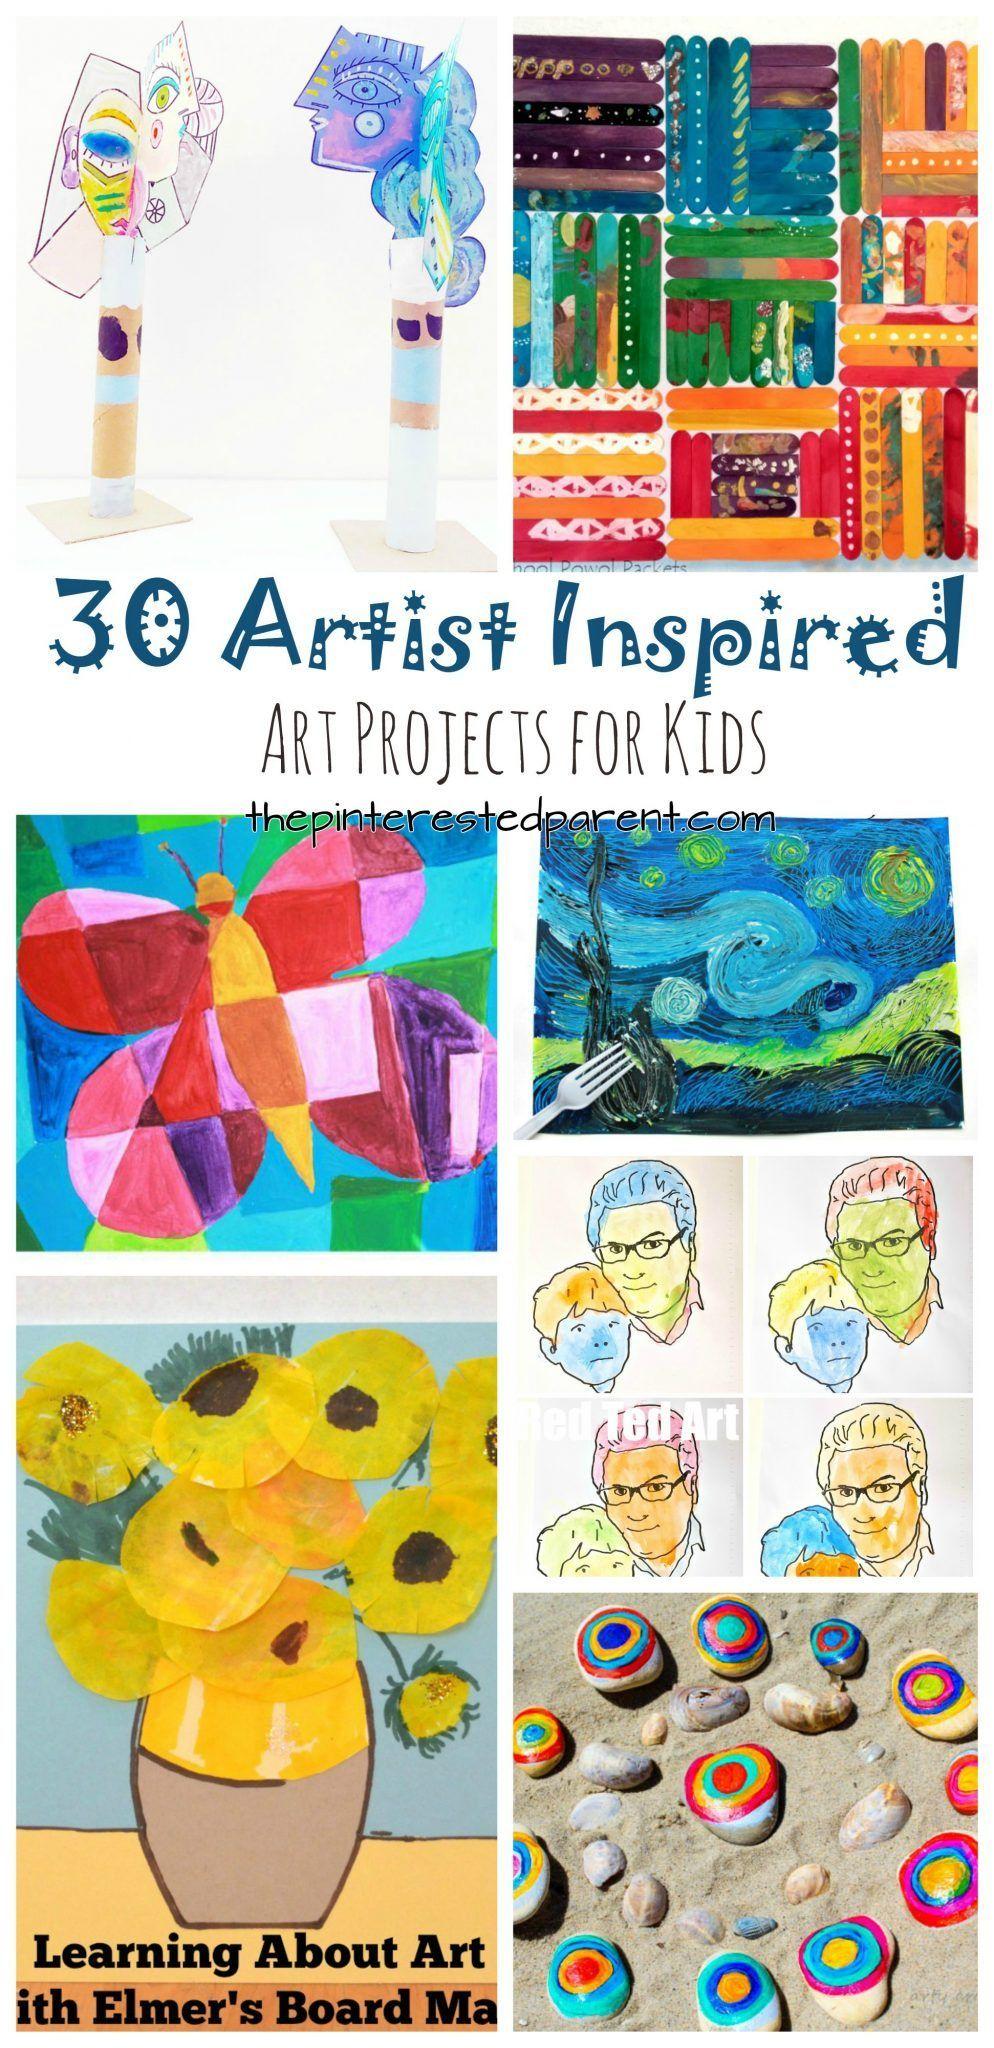 30 Artist Inspired Art Projects For Kids The Pinterested Parent Homeschool Art Kids Art Projects Artists For Kids